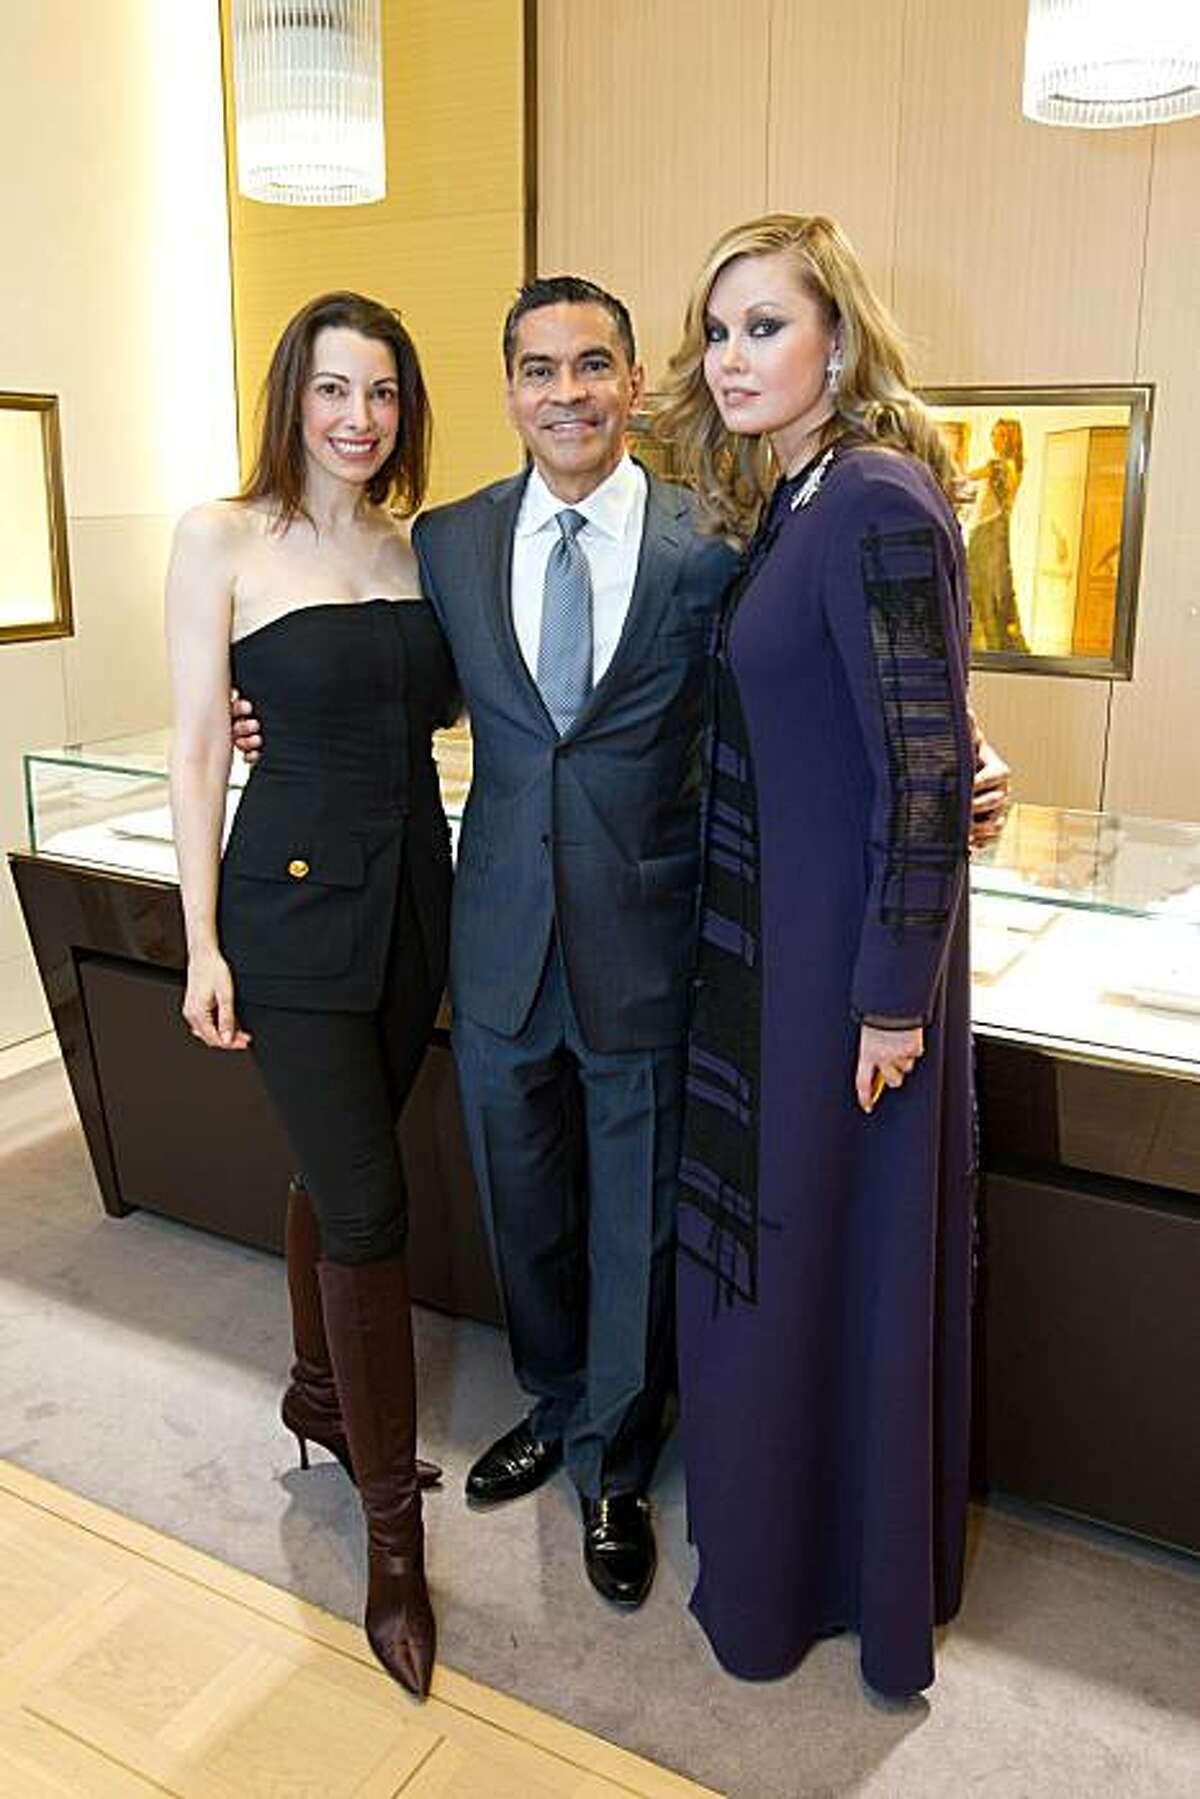 L to R: Shannon Bavaro, Bulgari boutique manager Daniel Diaz and Tatianna Sorokko.